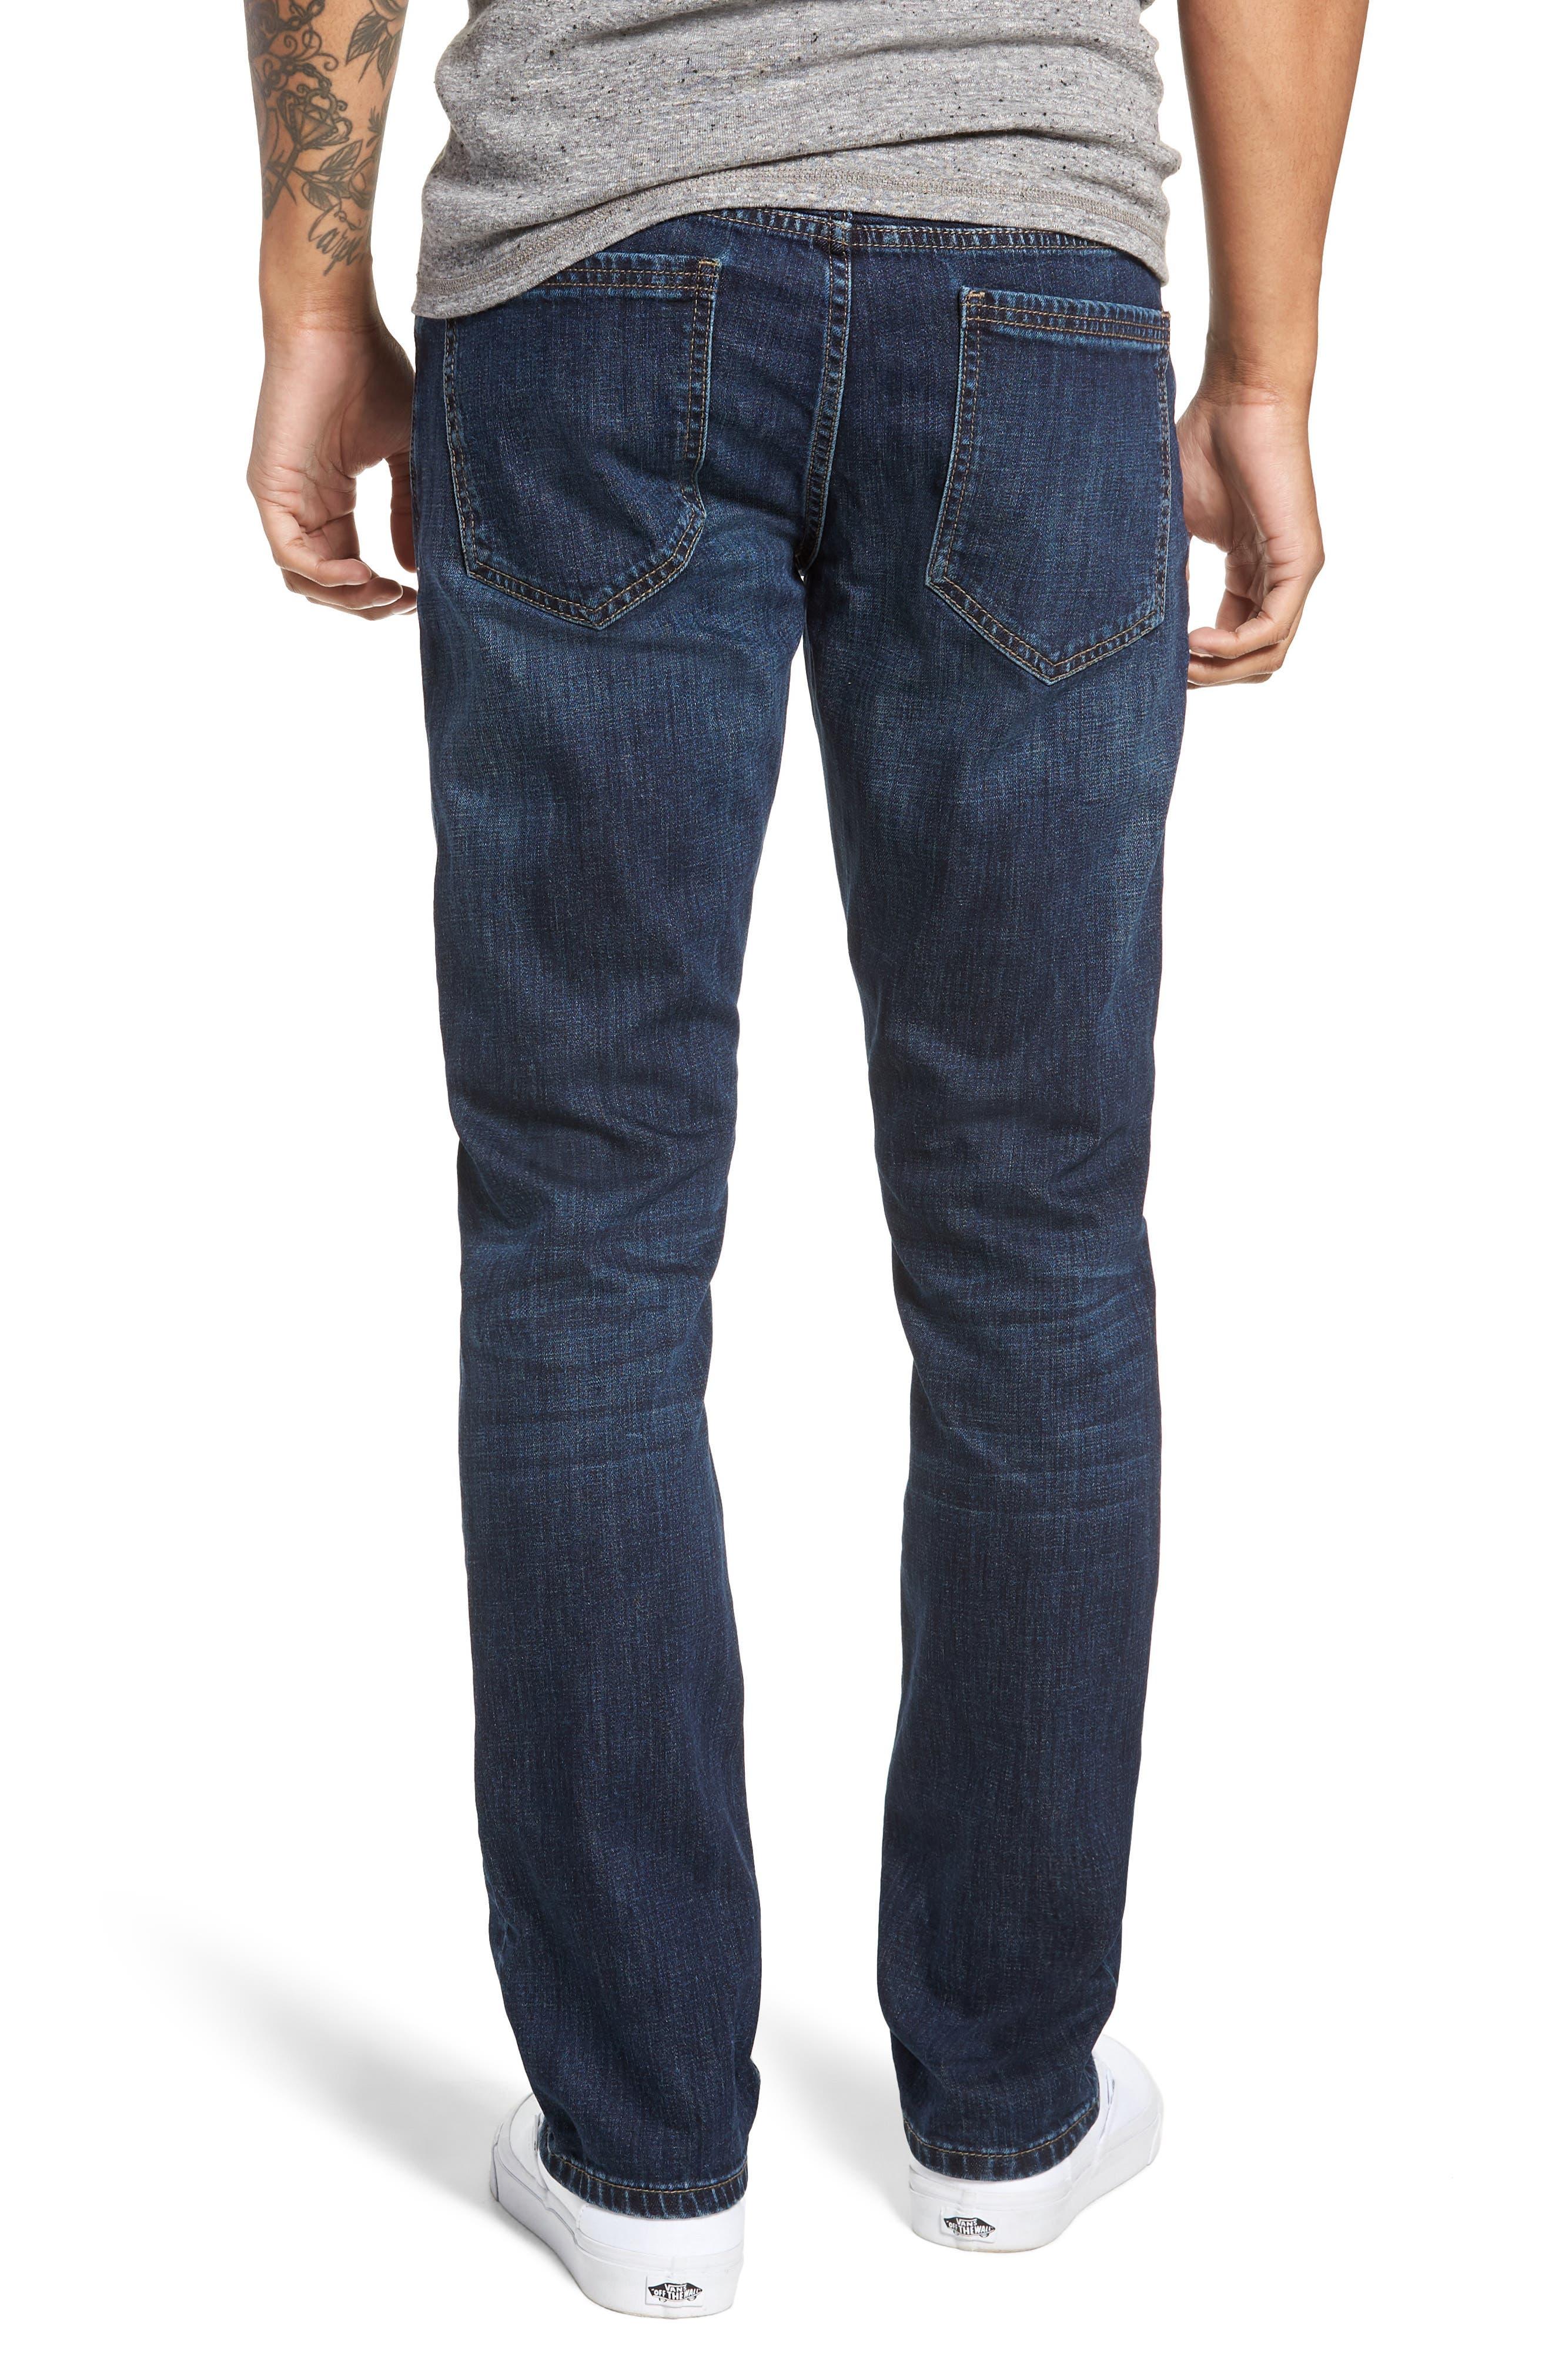 Wooster Slim Fit Jeans,                             Alternate thumbnail 2, color,                             THROTTLE THRUST